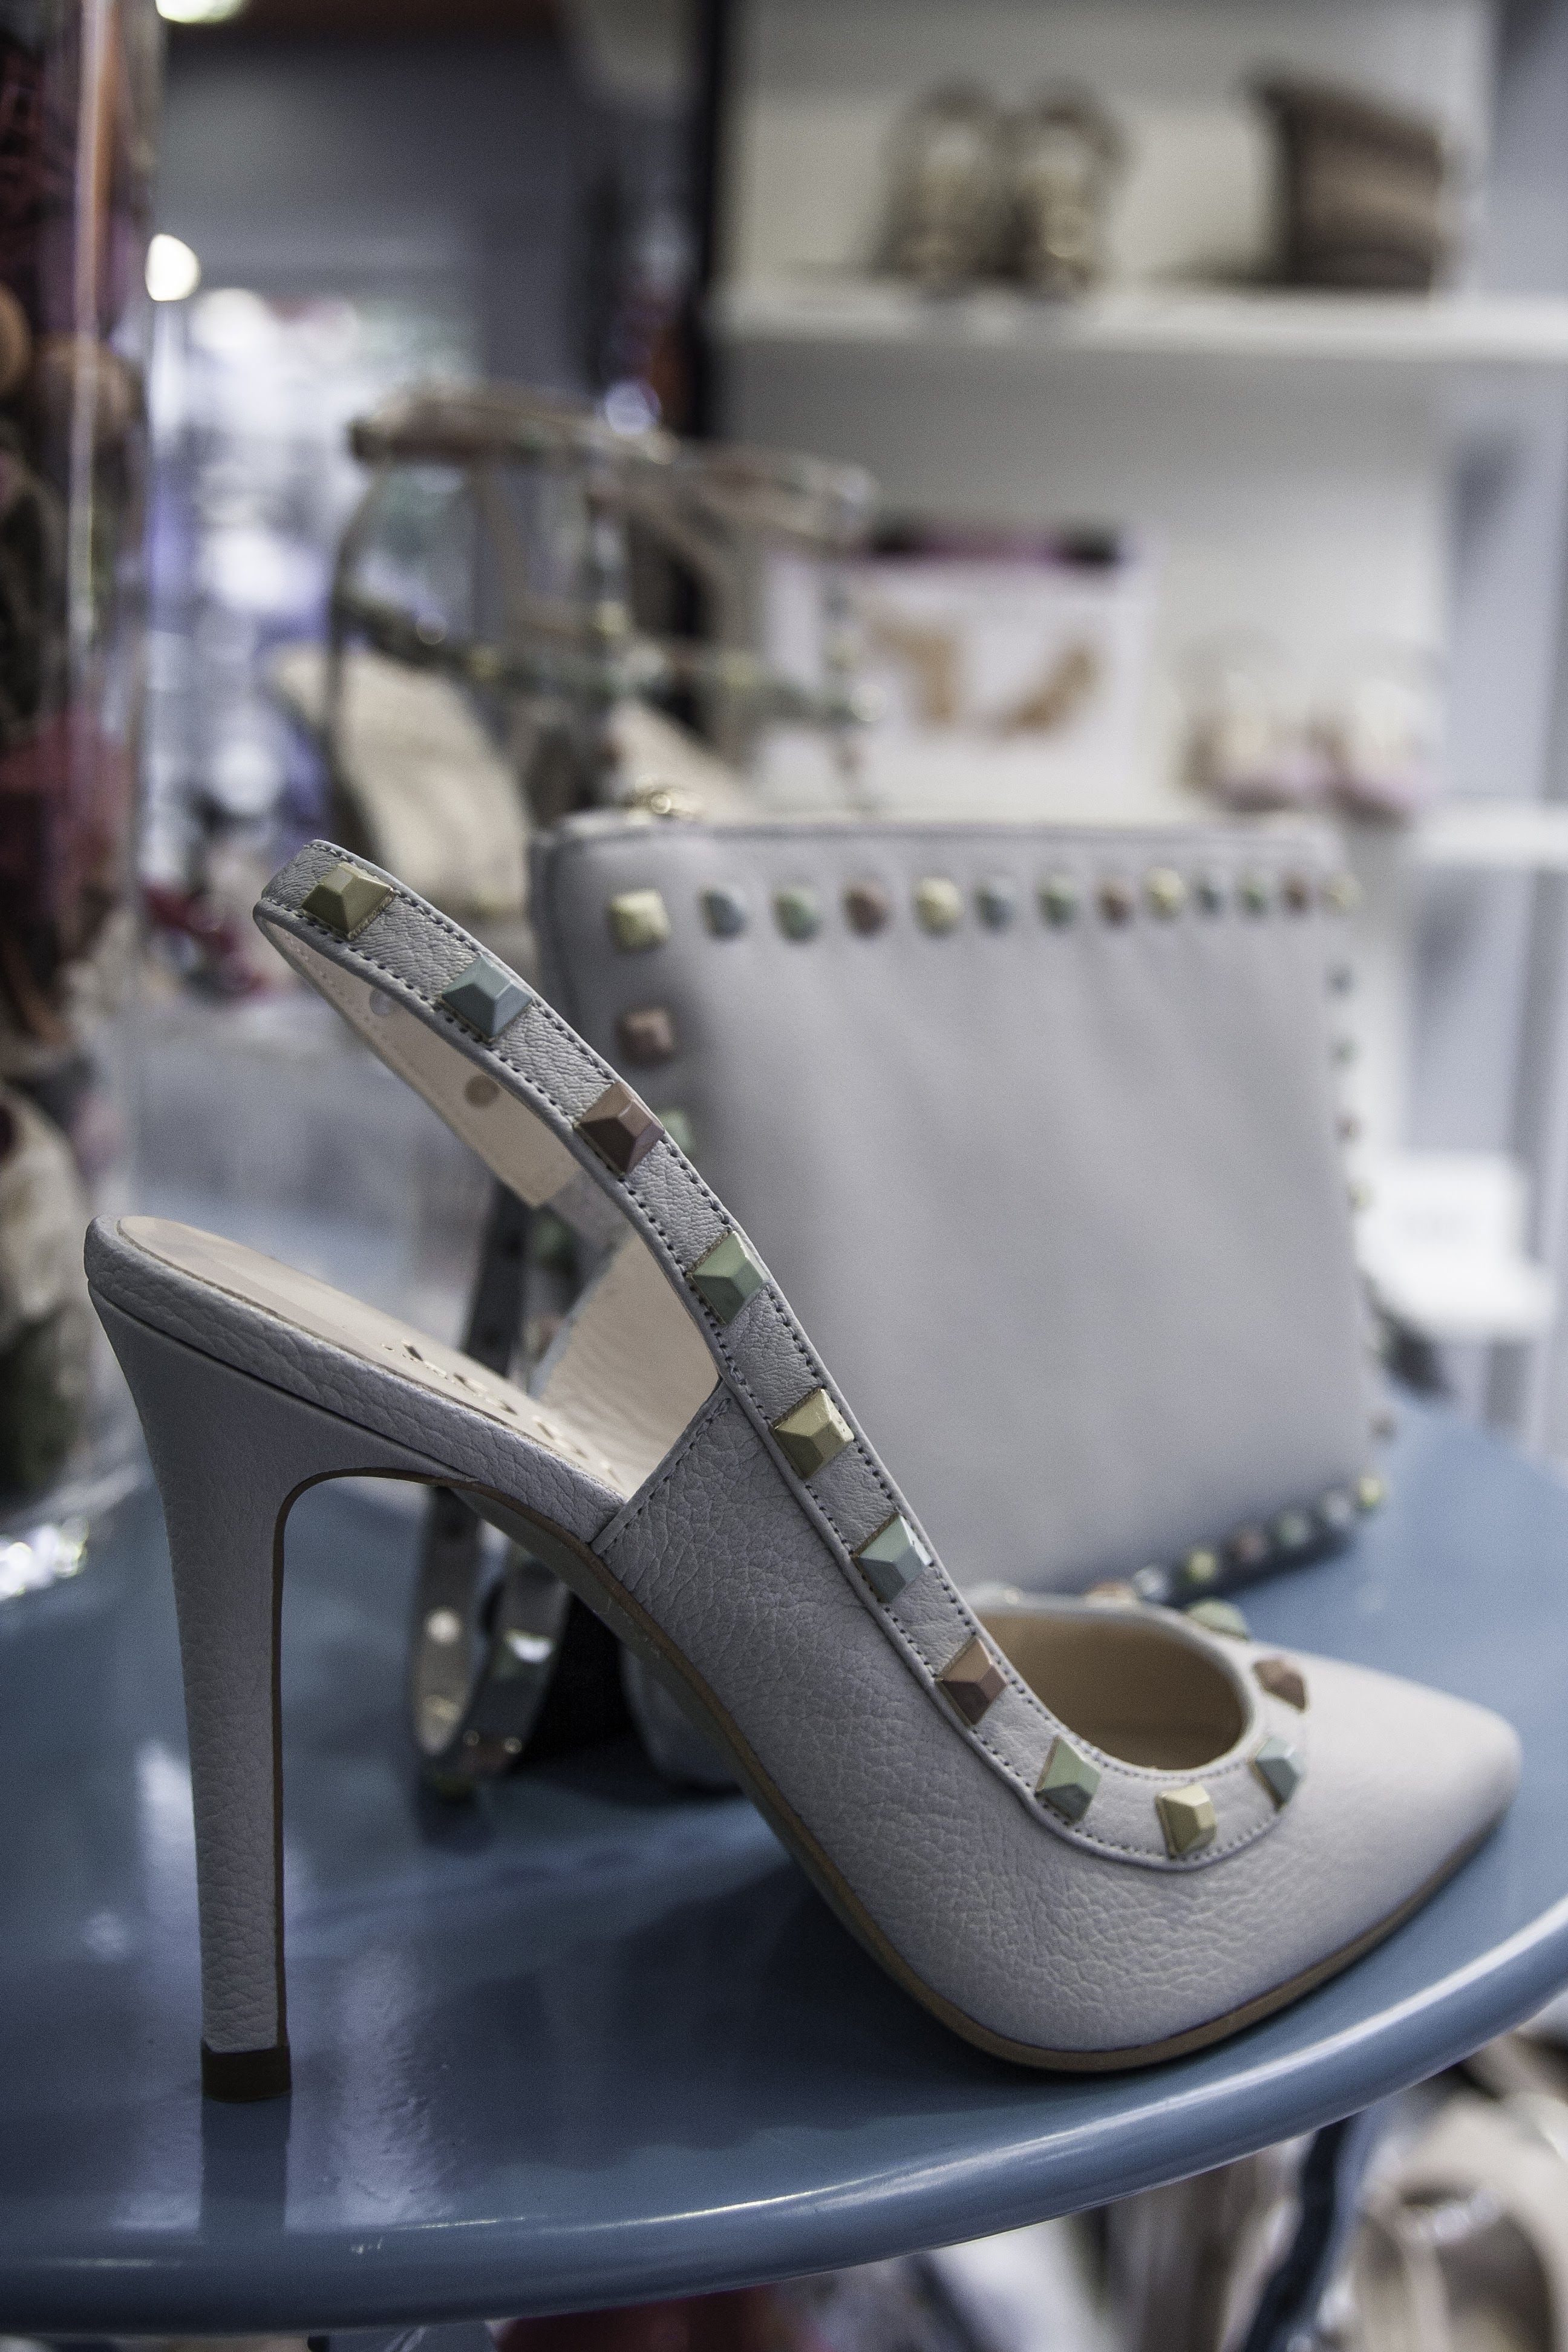 Foto 5 de Calzado para mujer en  | Calzados Prietos